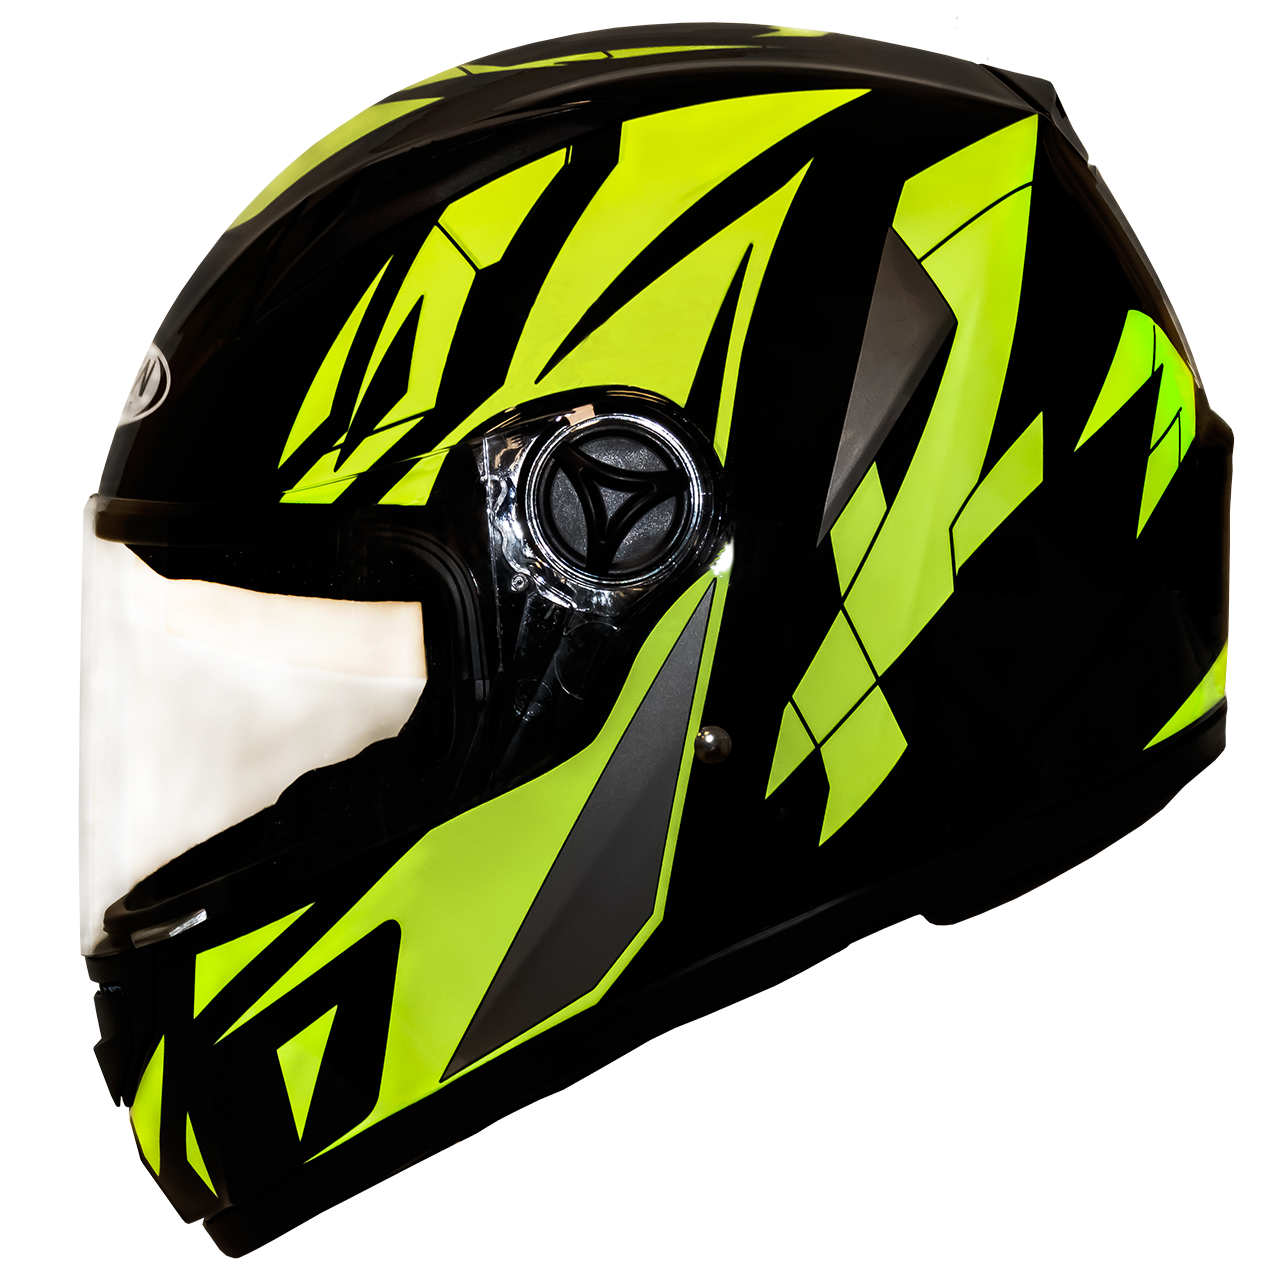 Мотошлем FXW HF-111 solid black-yellow закрытый шлем интеграл, full-face чёрно-жёлтый